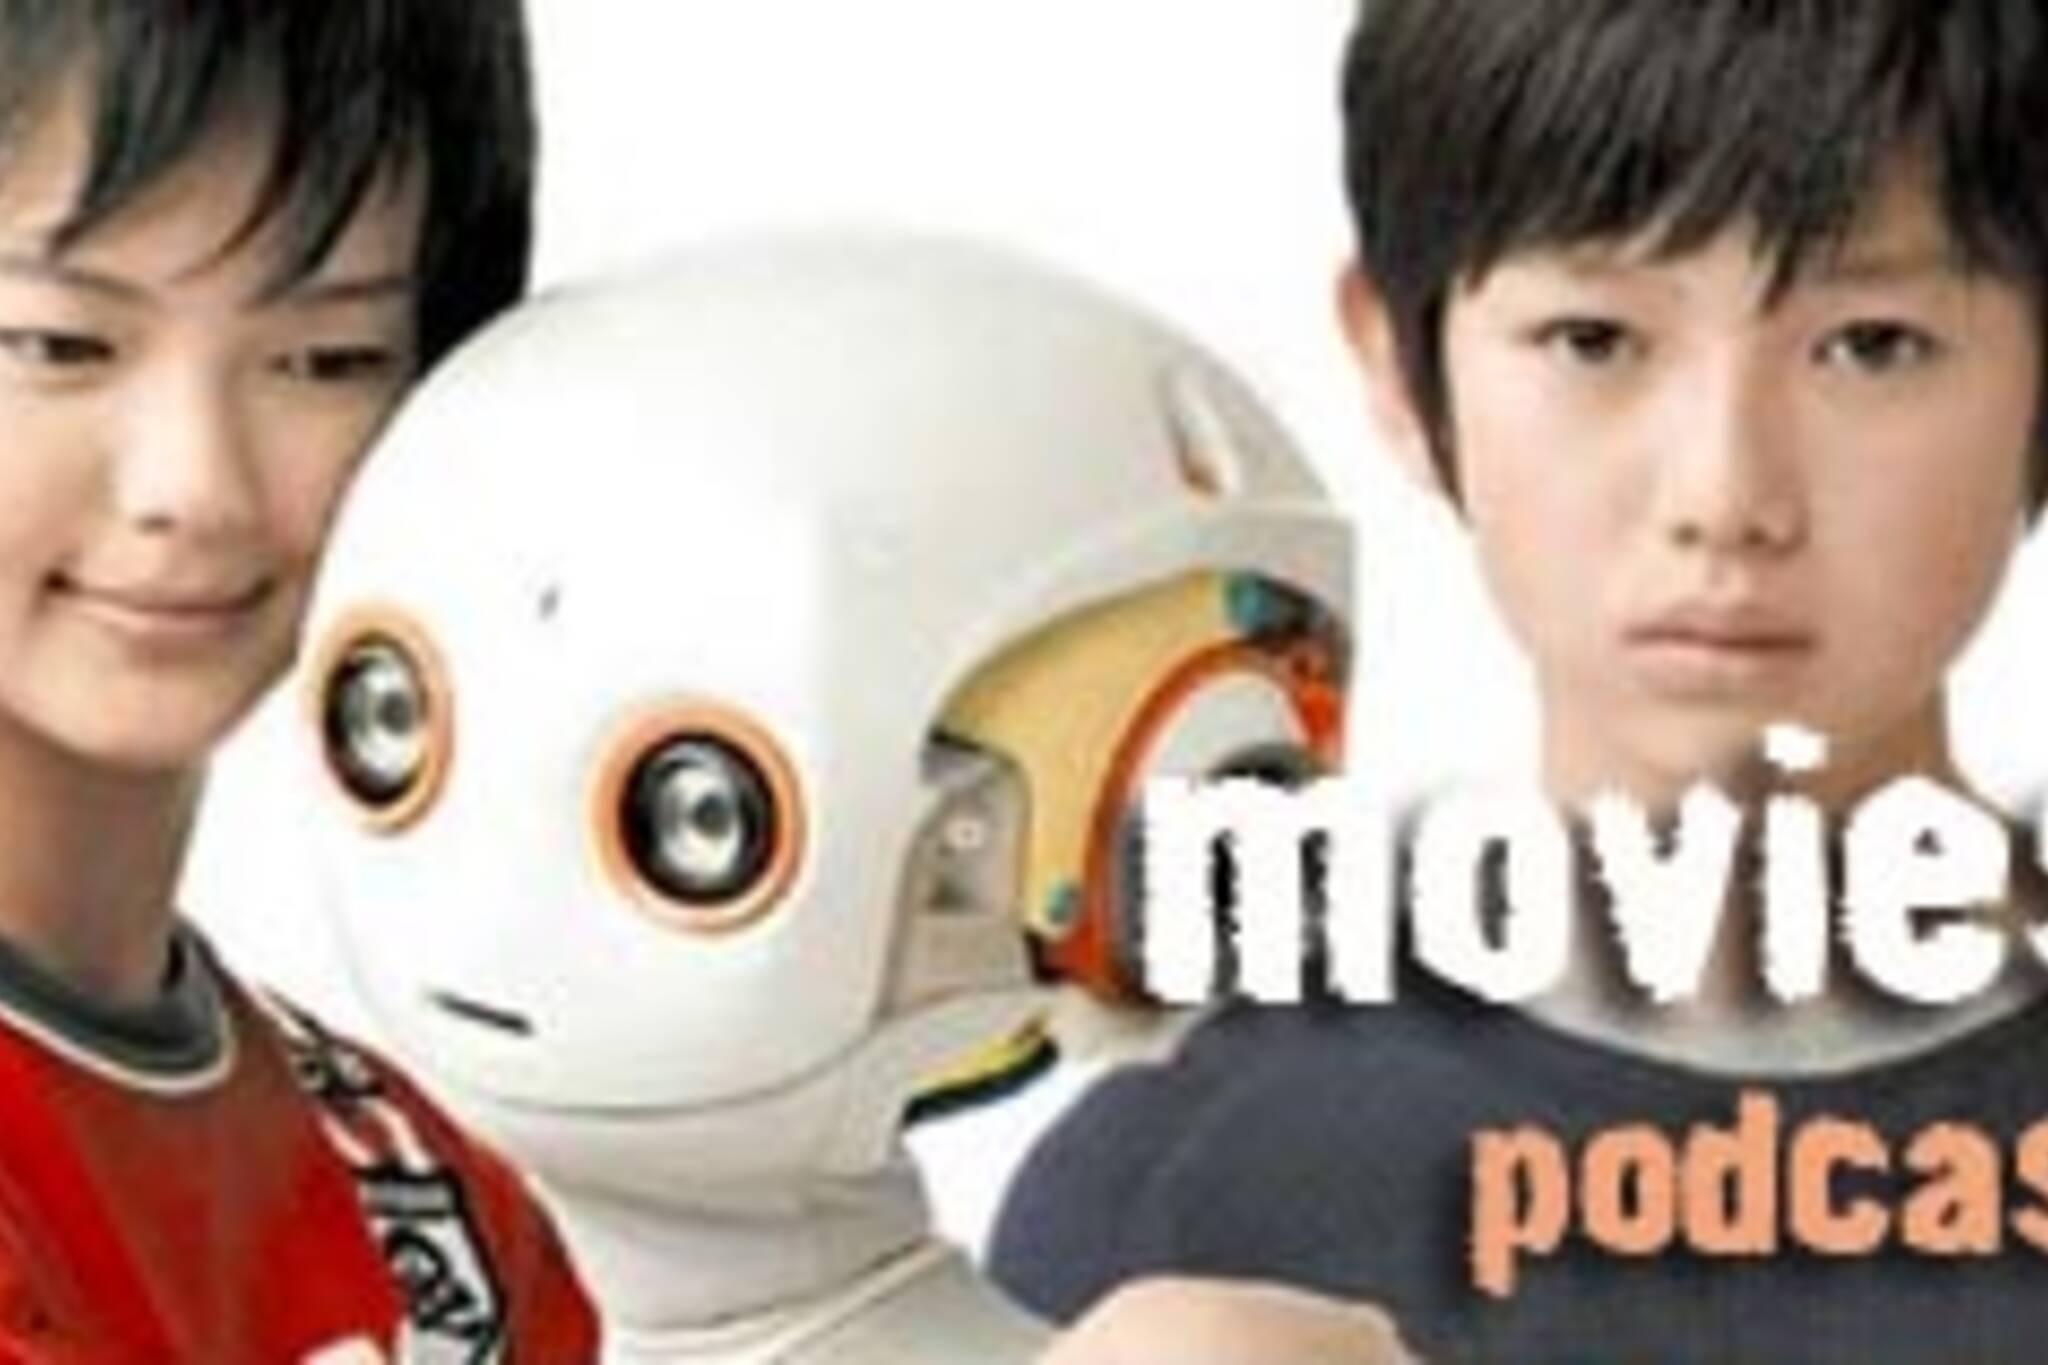 moviesto_may32006.jpg